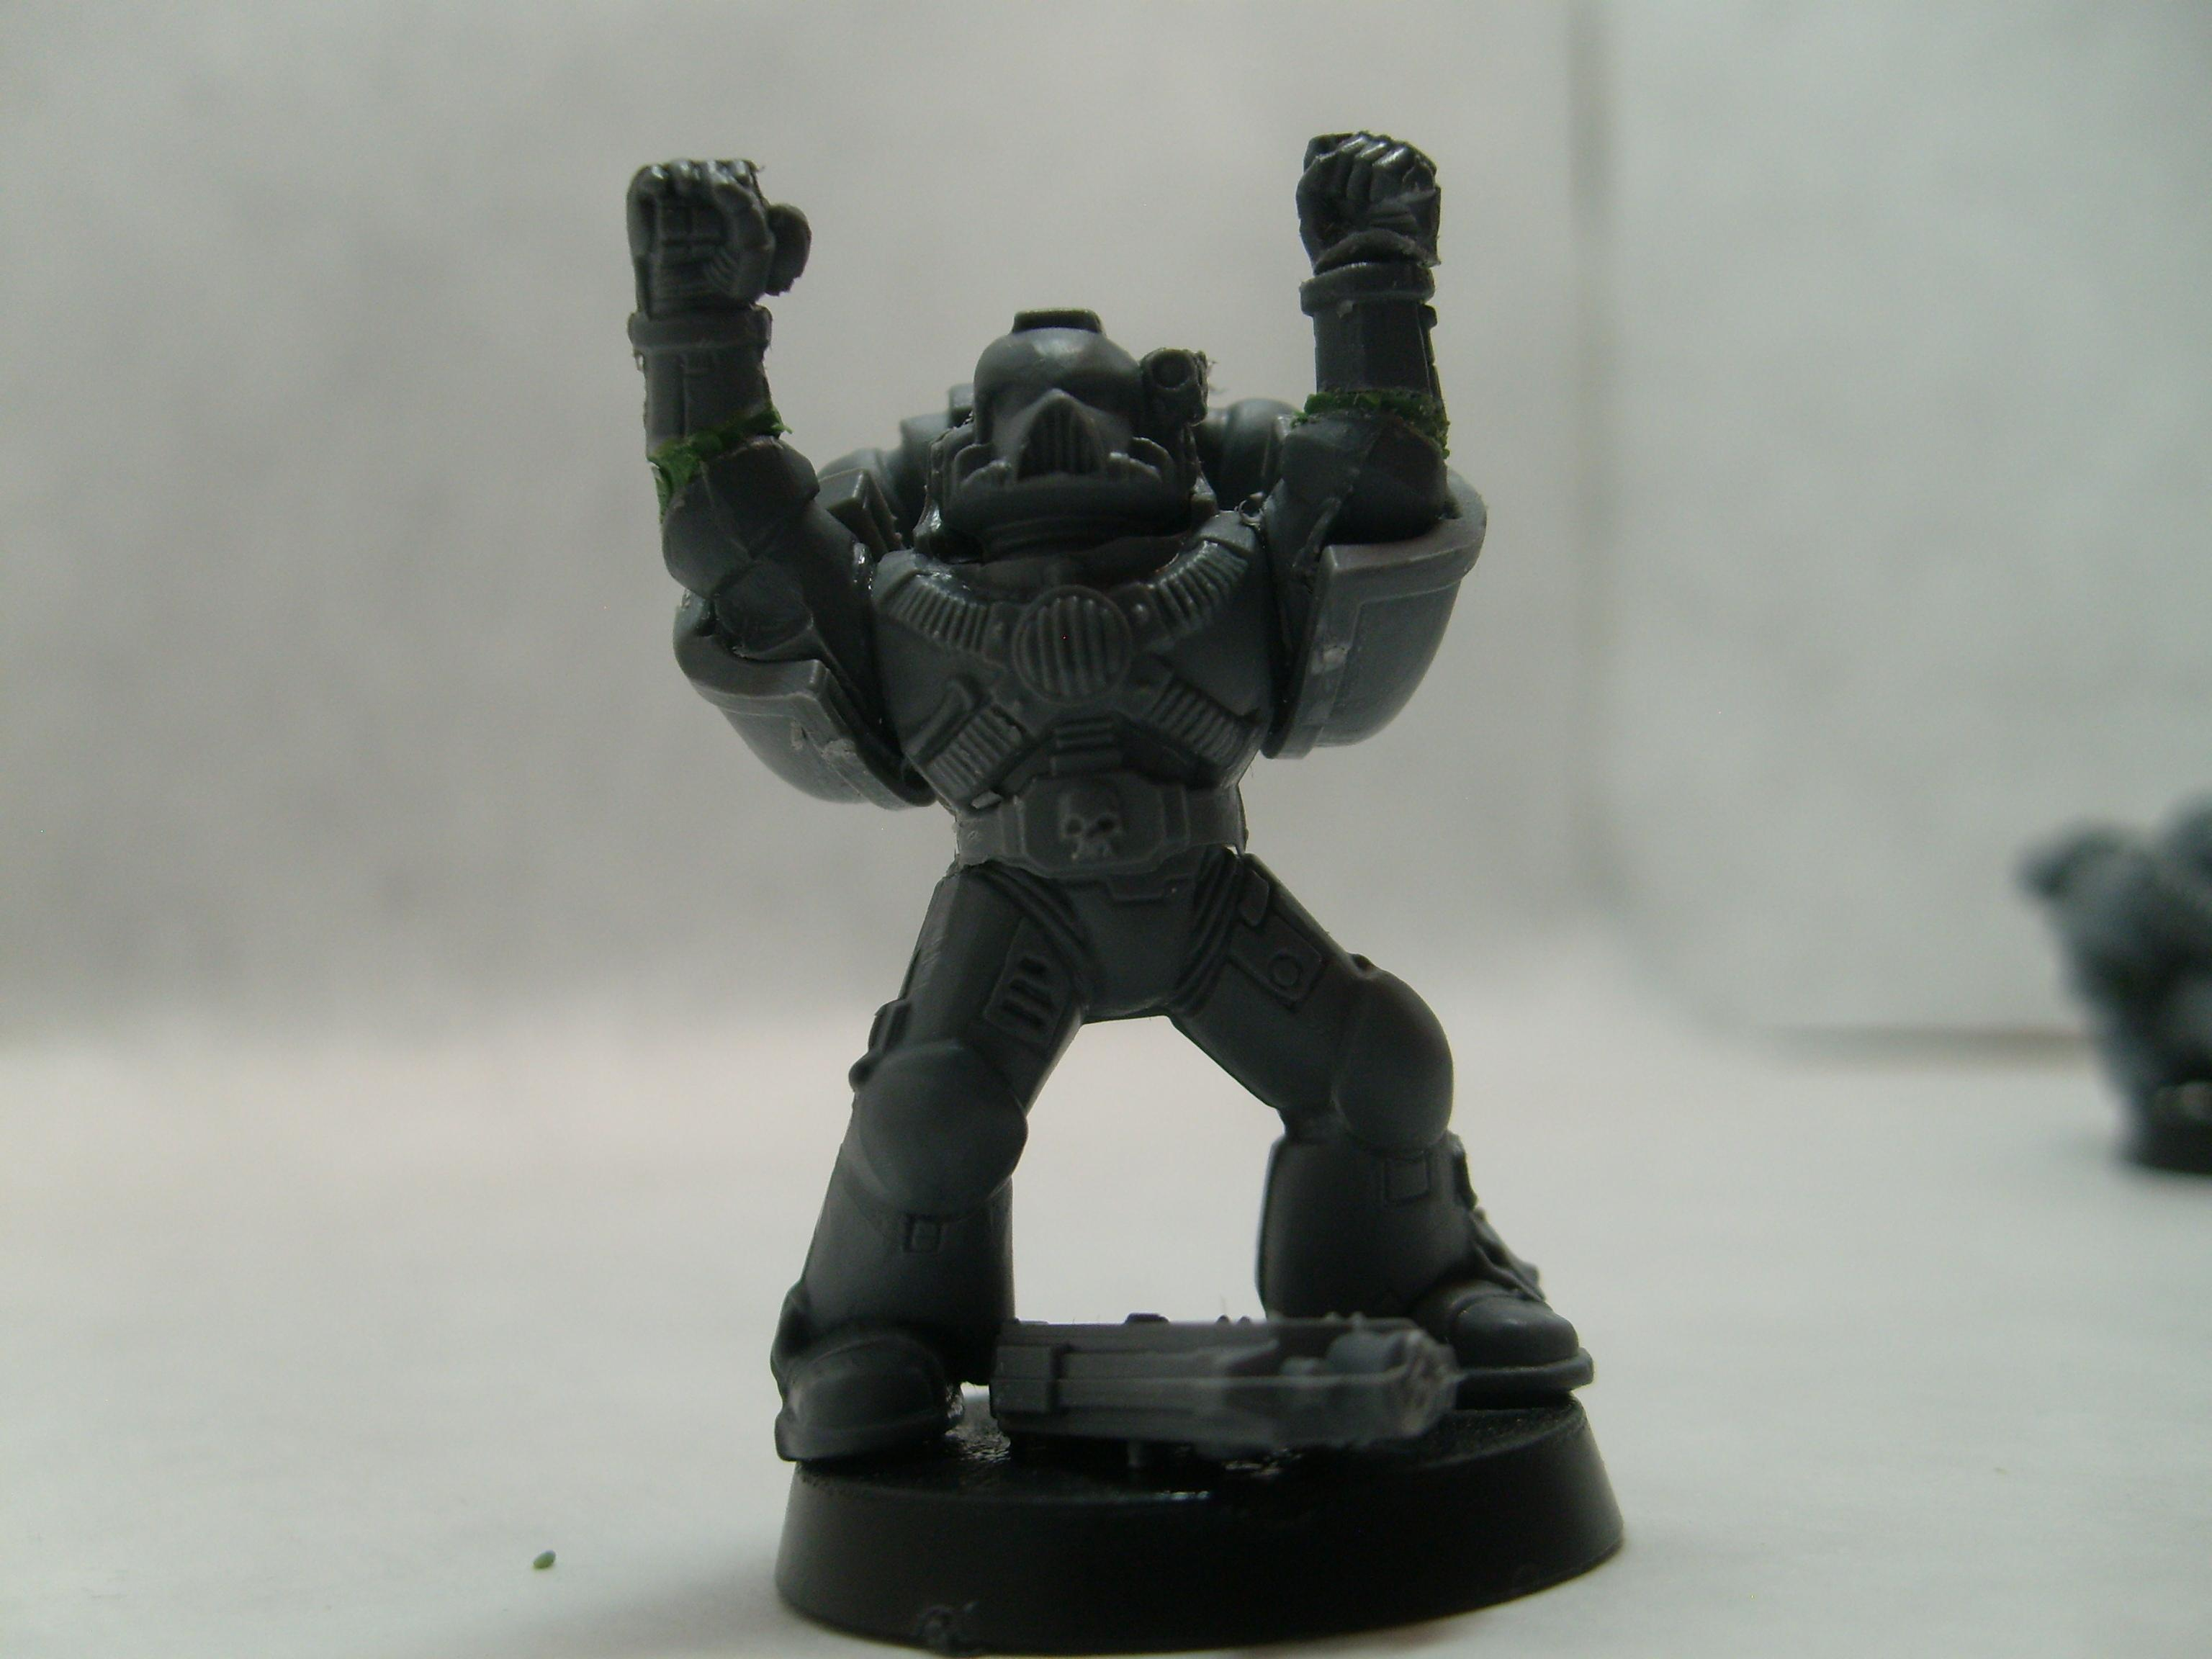 Victory pose